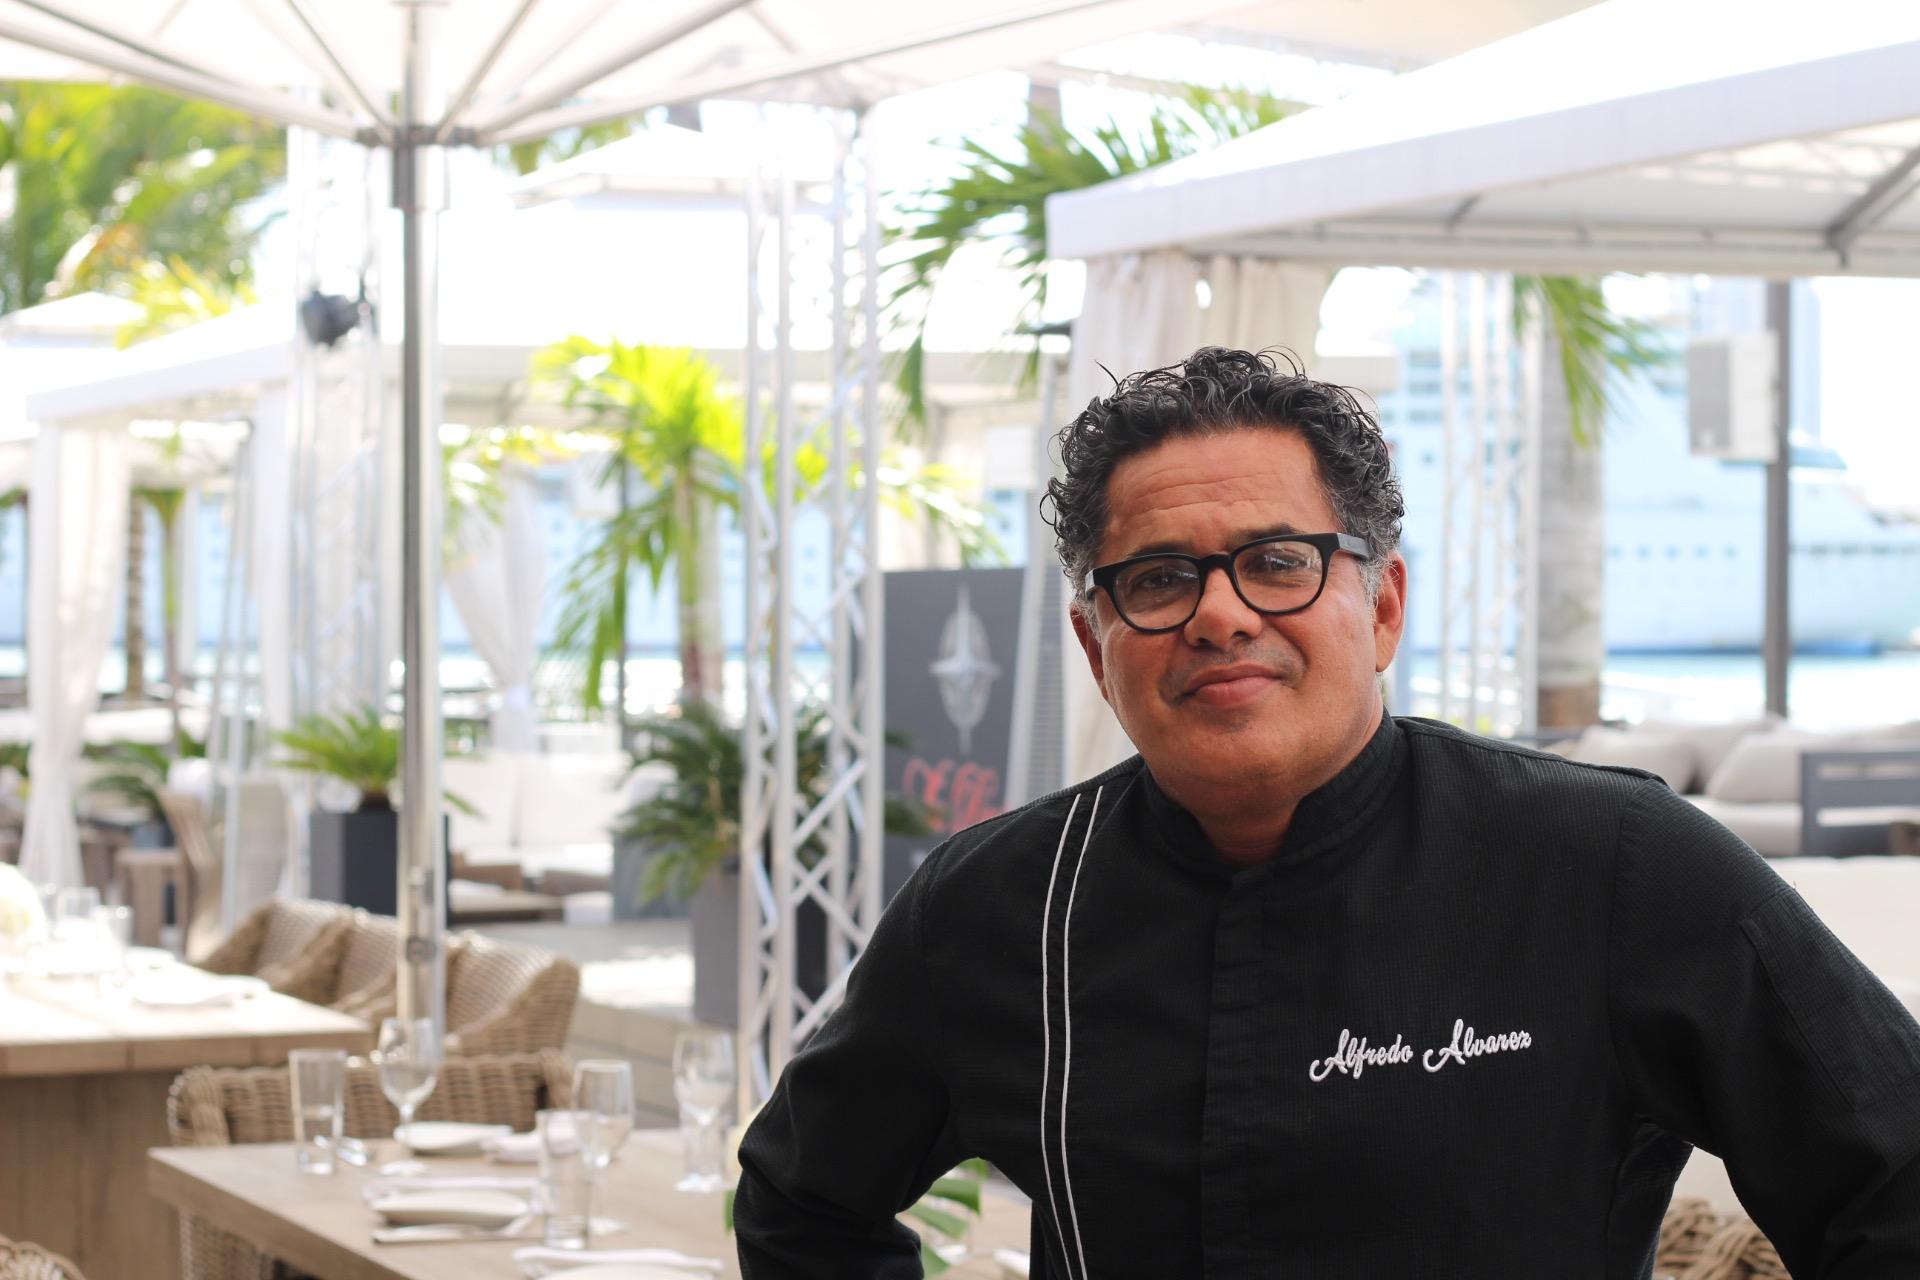 Executive Chef Alfredo Alvarez of The Deck at Island Gardens